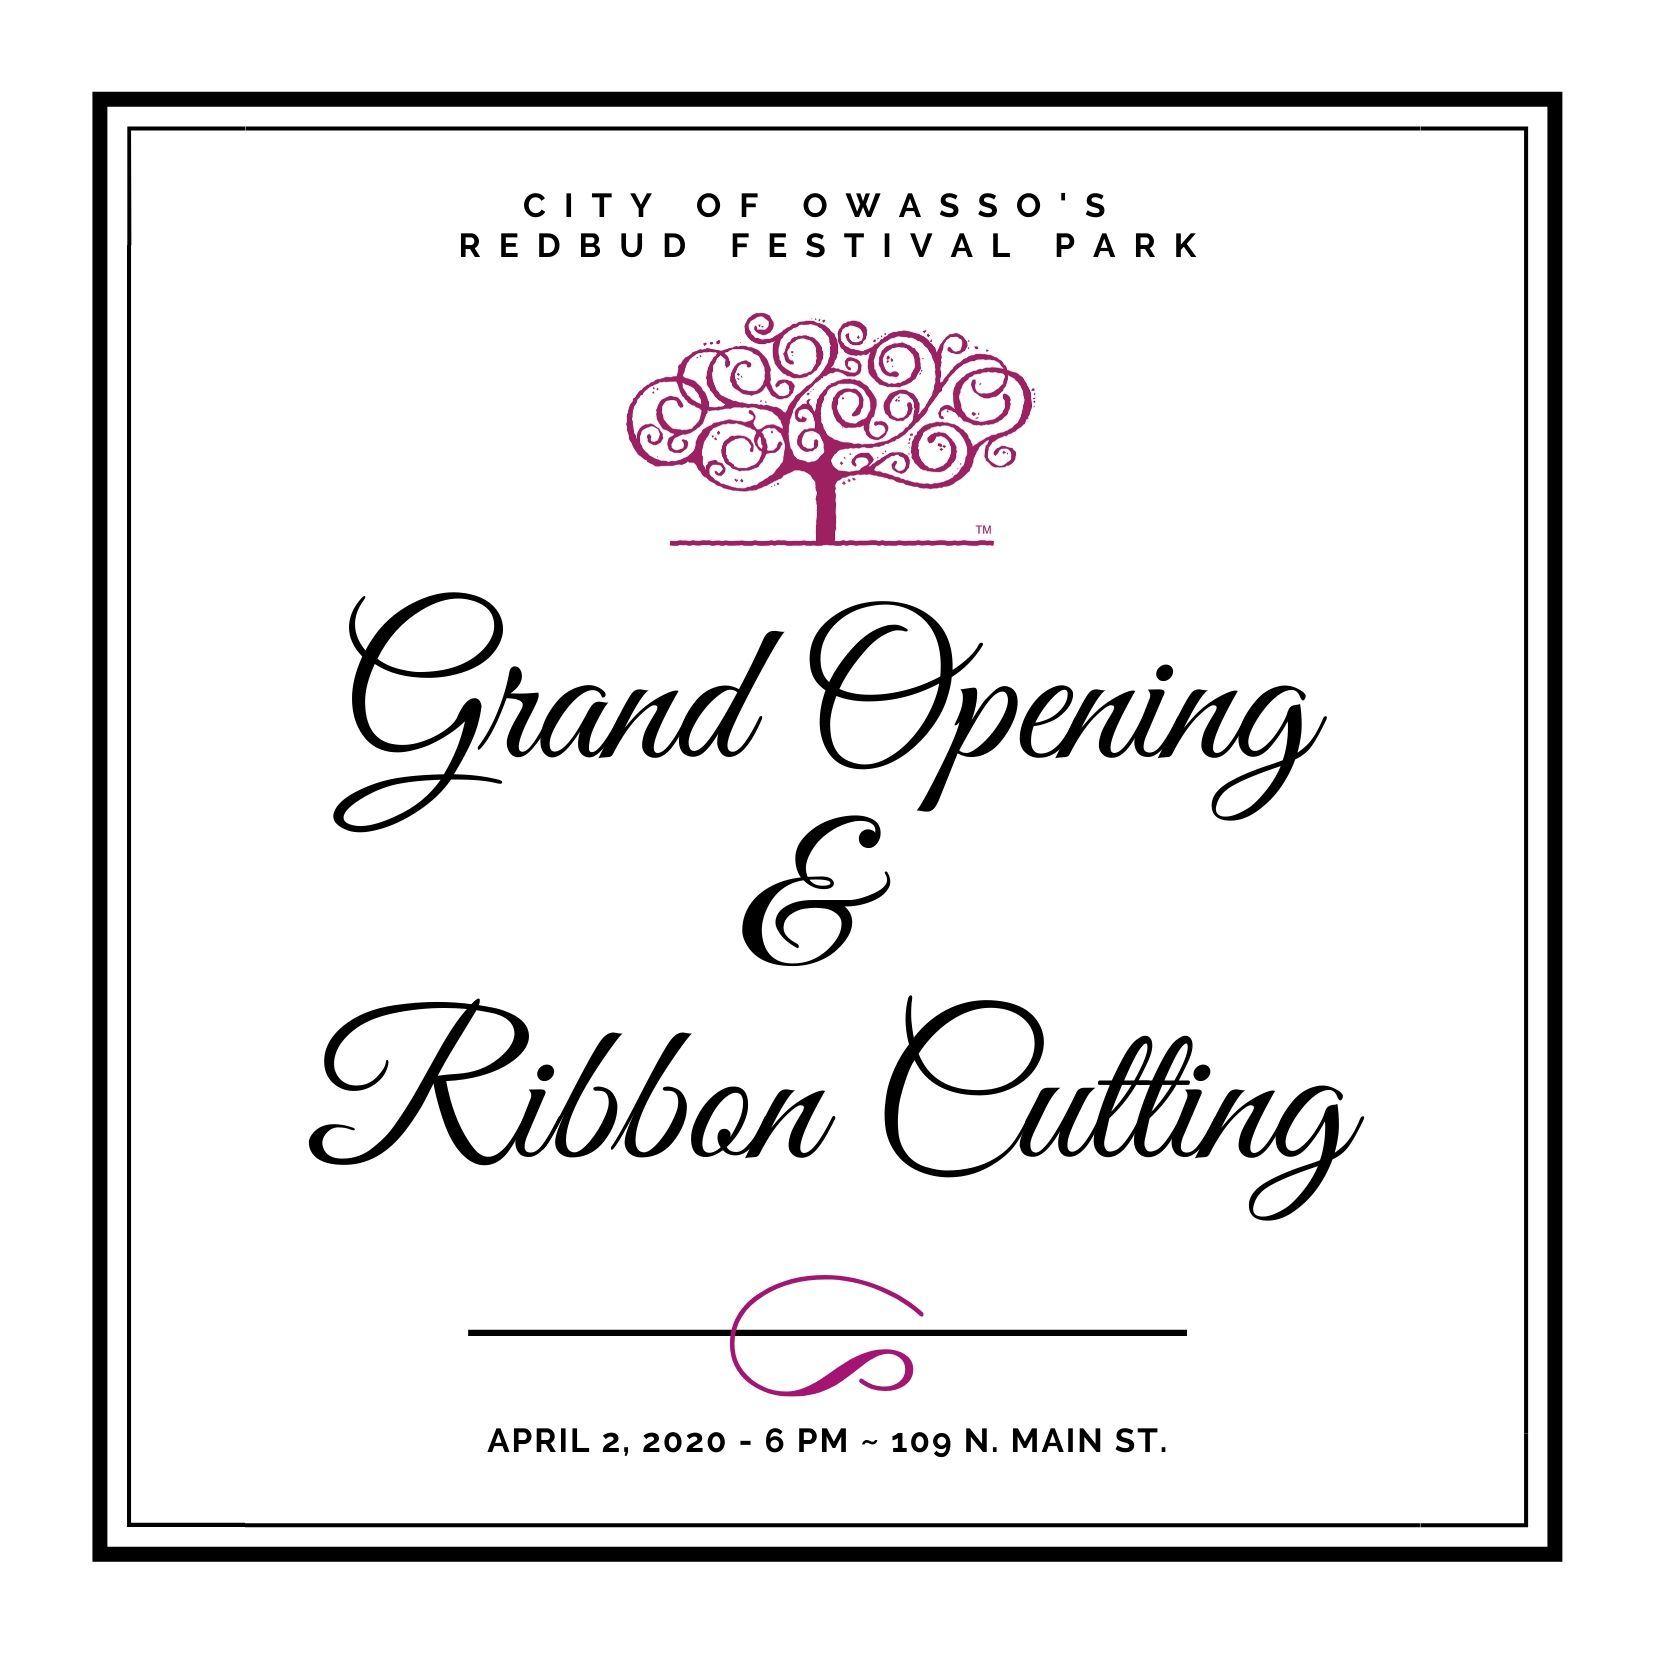 Redbud Grand Opening Invitation